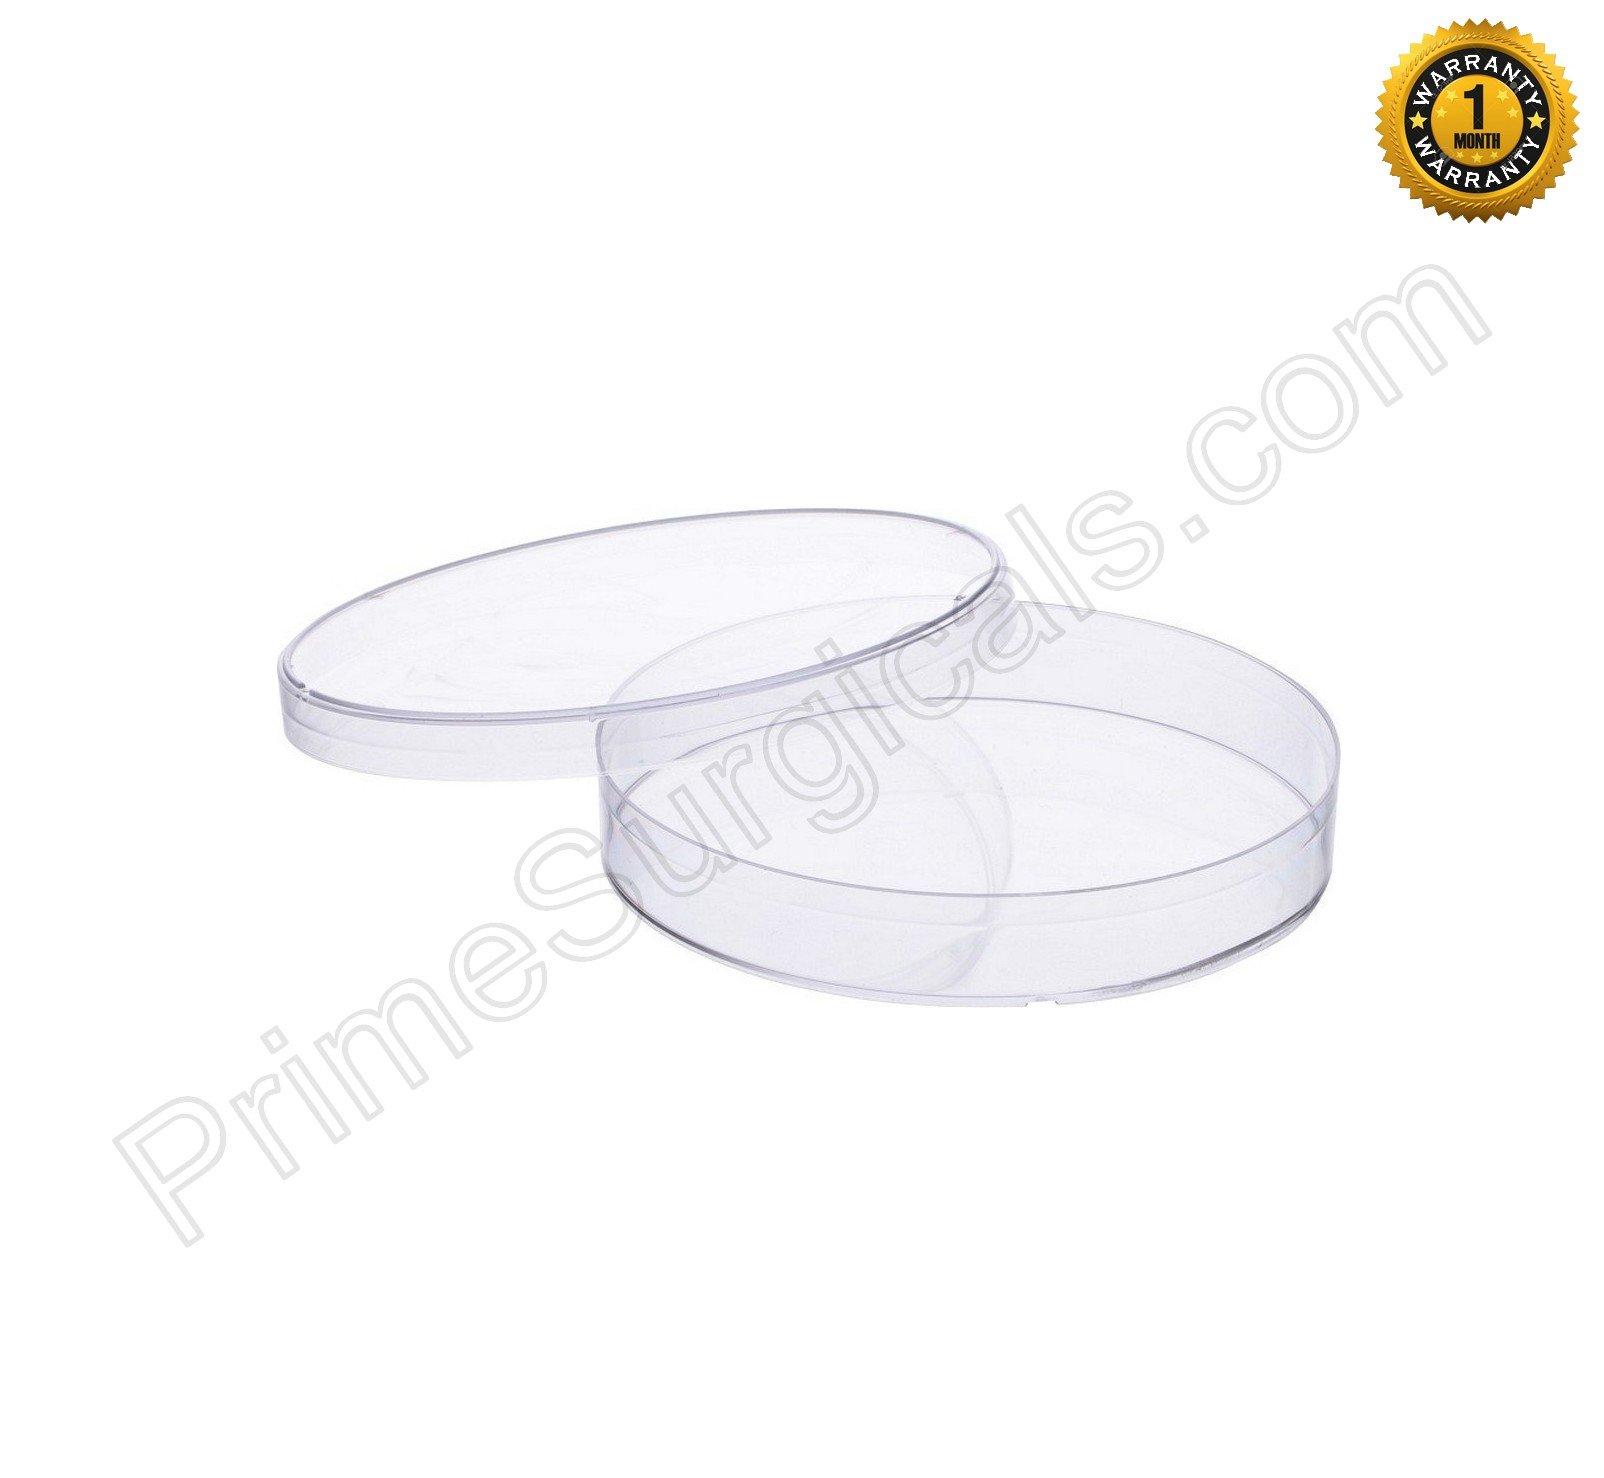 Petri Dish, Polypropylene (PP) - Pack of 36 Pcs. (100mm)